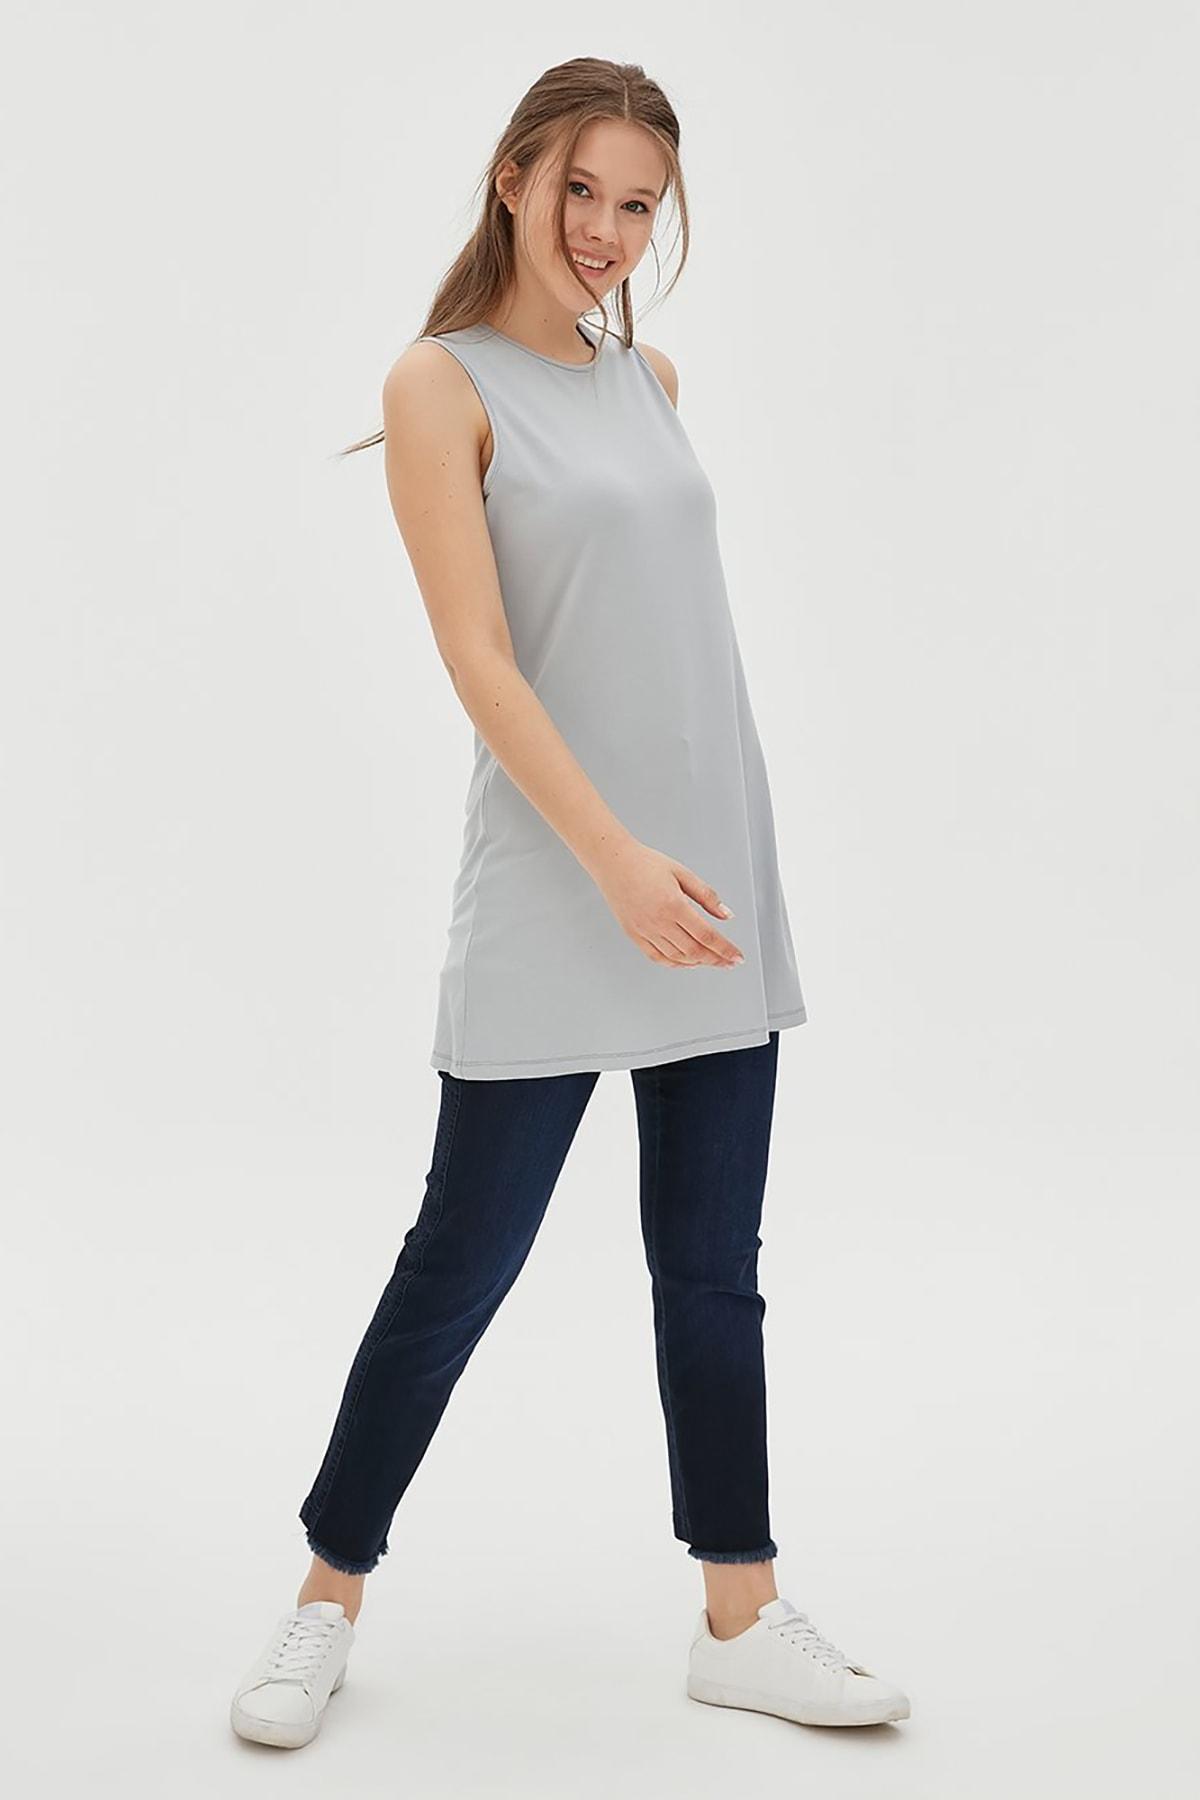 Kayra Kadın Basic Kolsuz Penye Bluz Gri Sz 10505